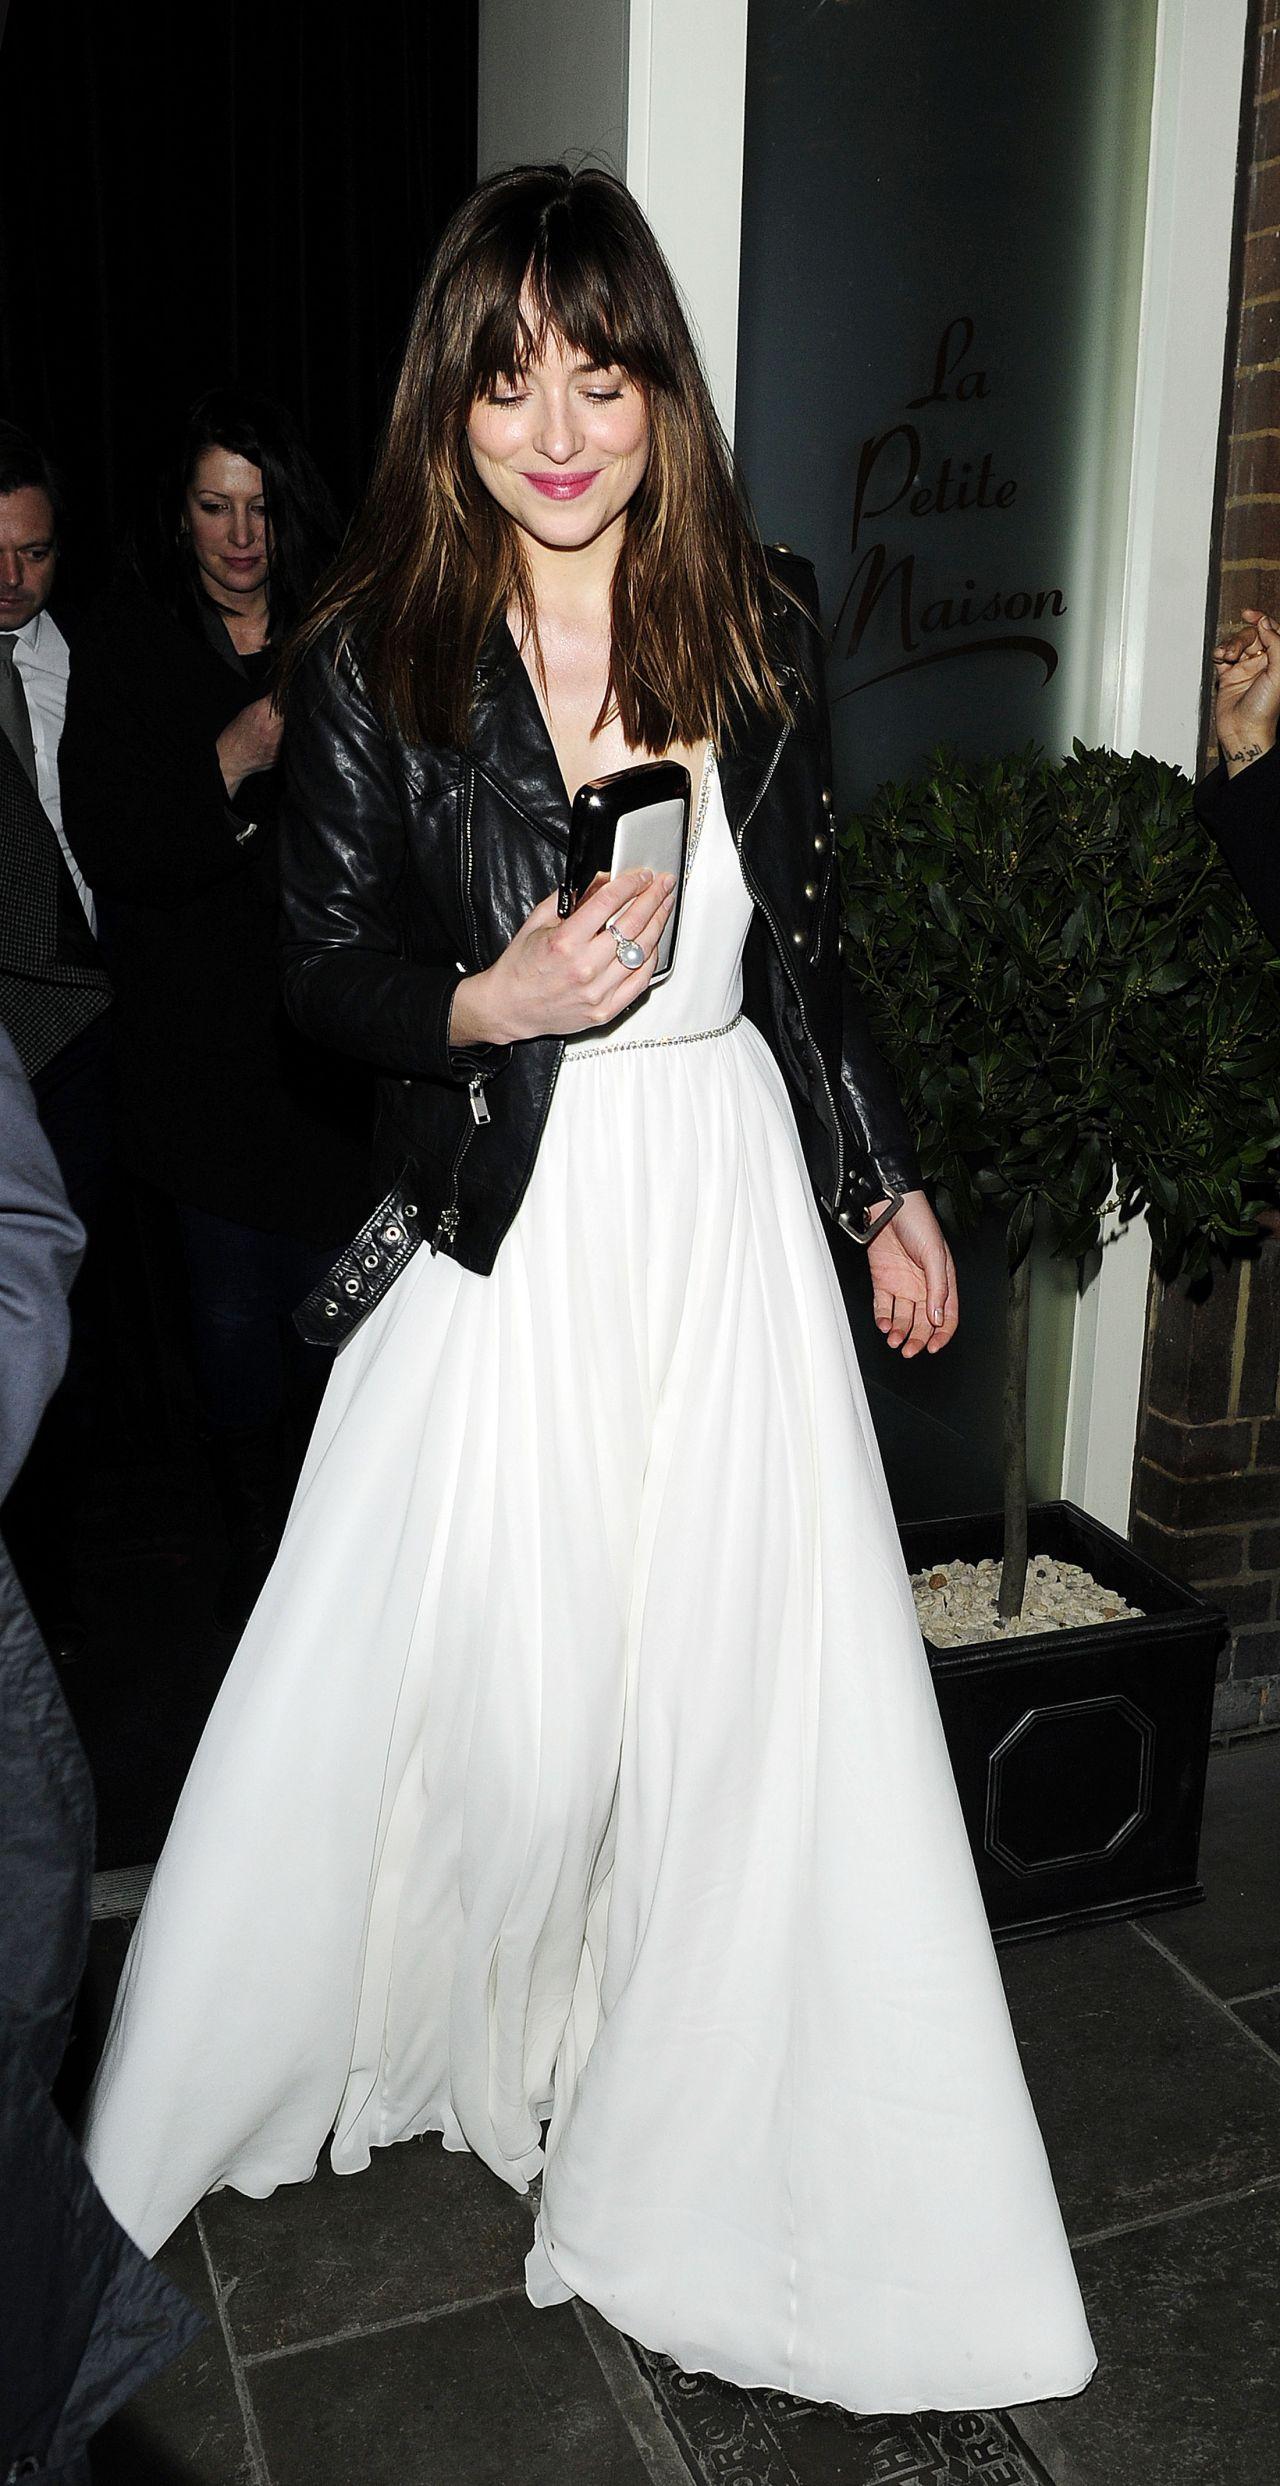 Dakota Johnson Leaving The Fifty Shades Of Grey